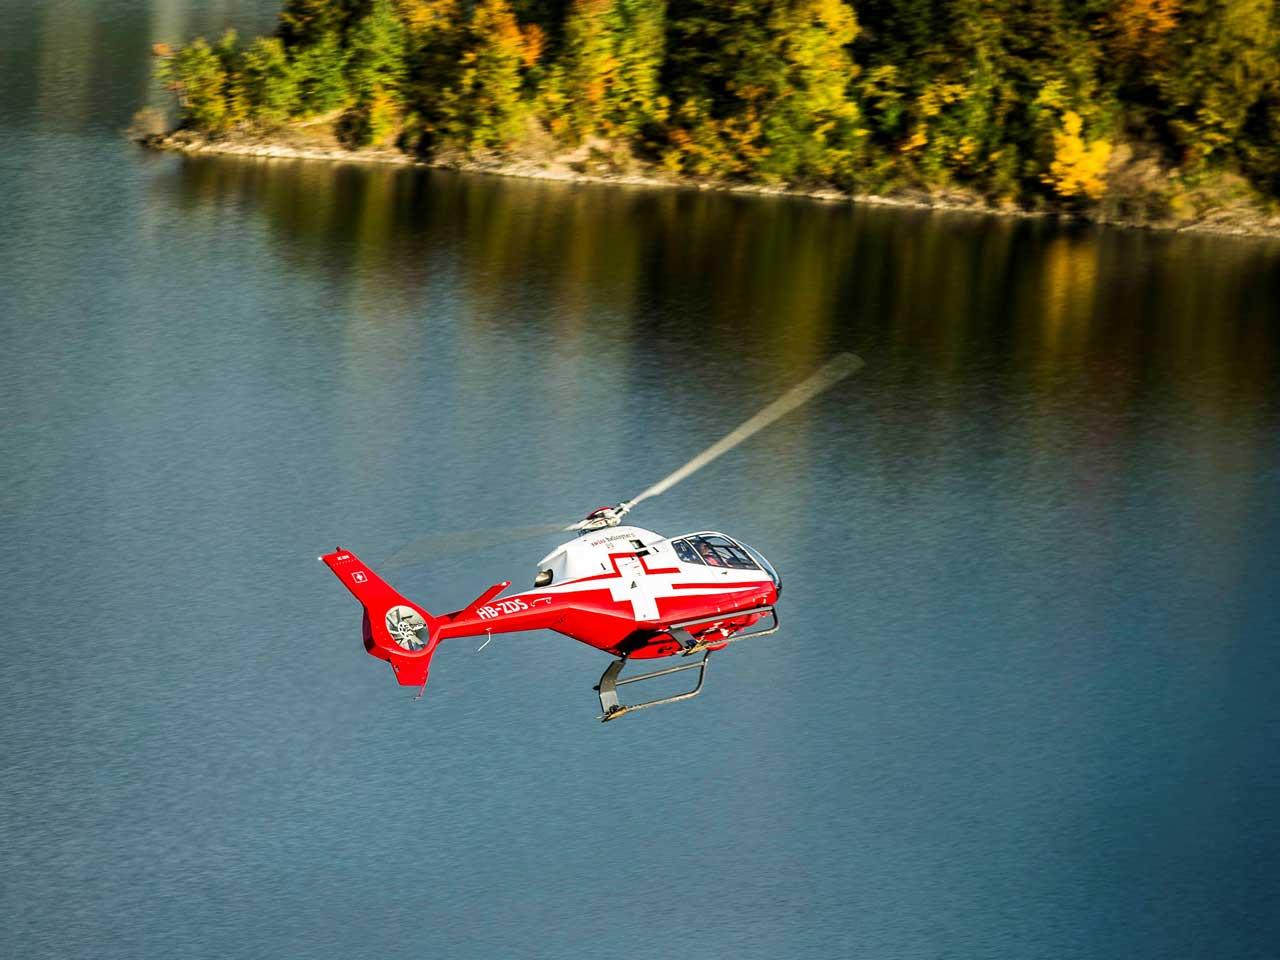 Helikopterflug mit Zmorge